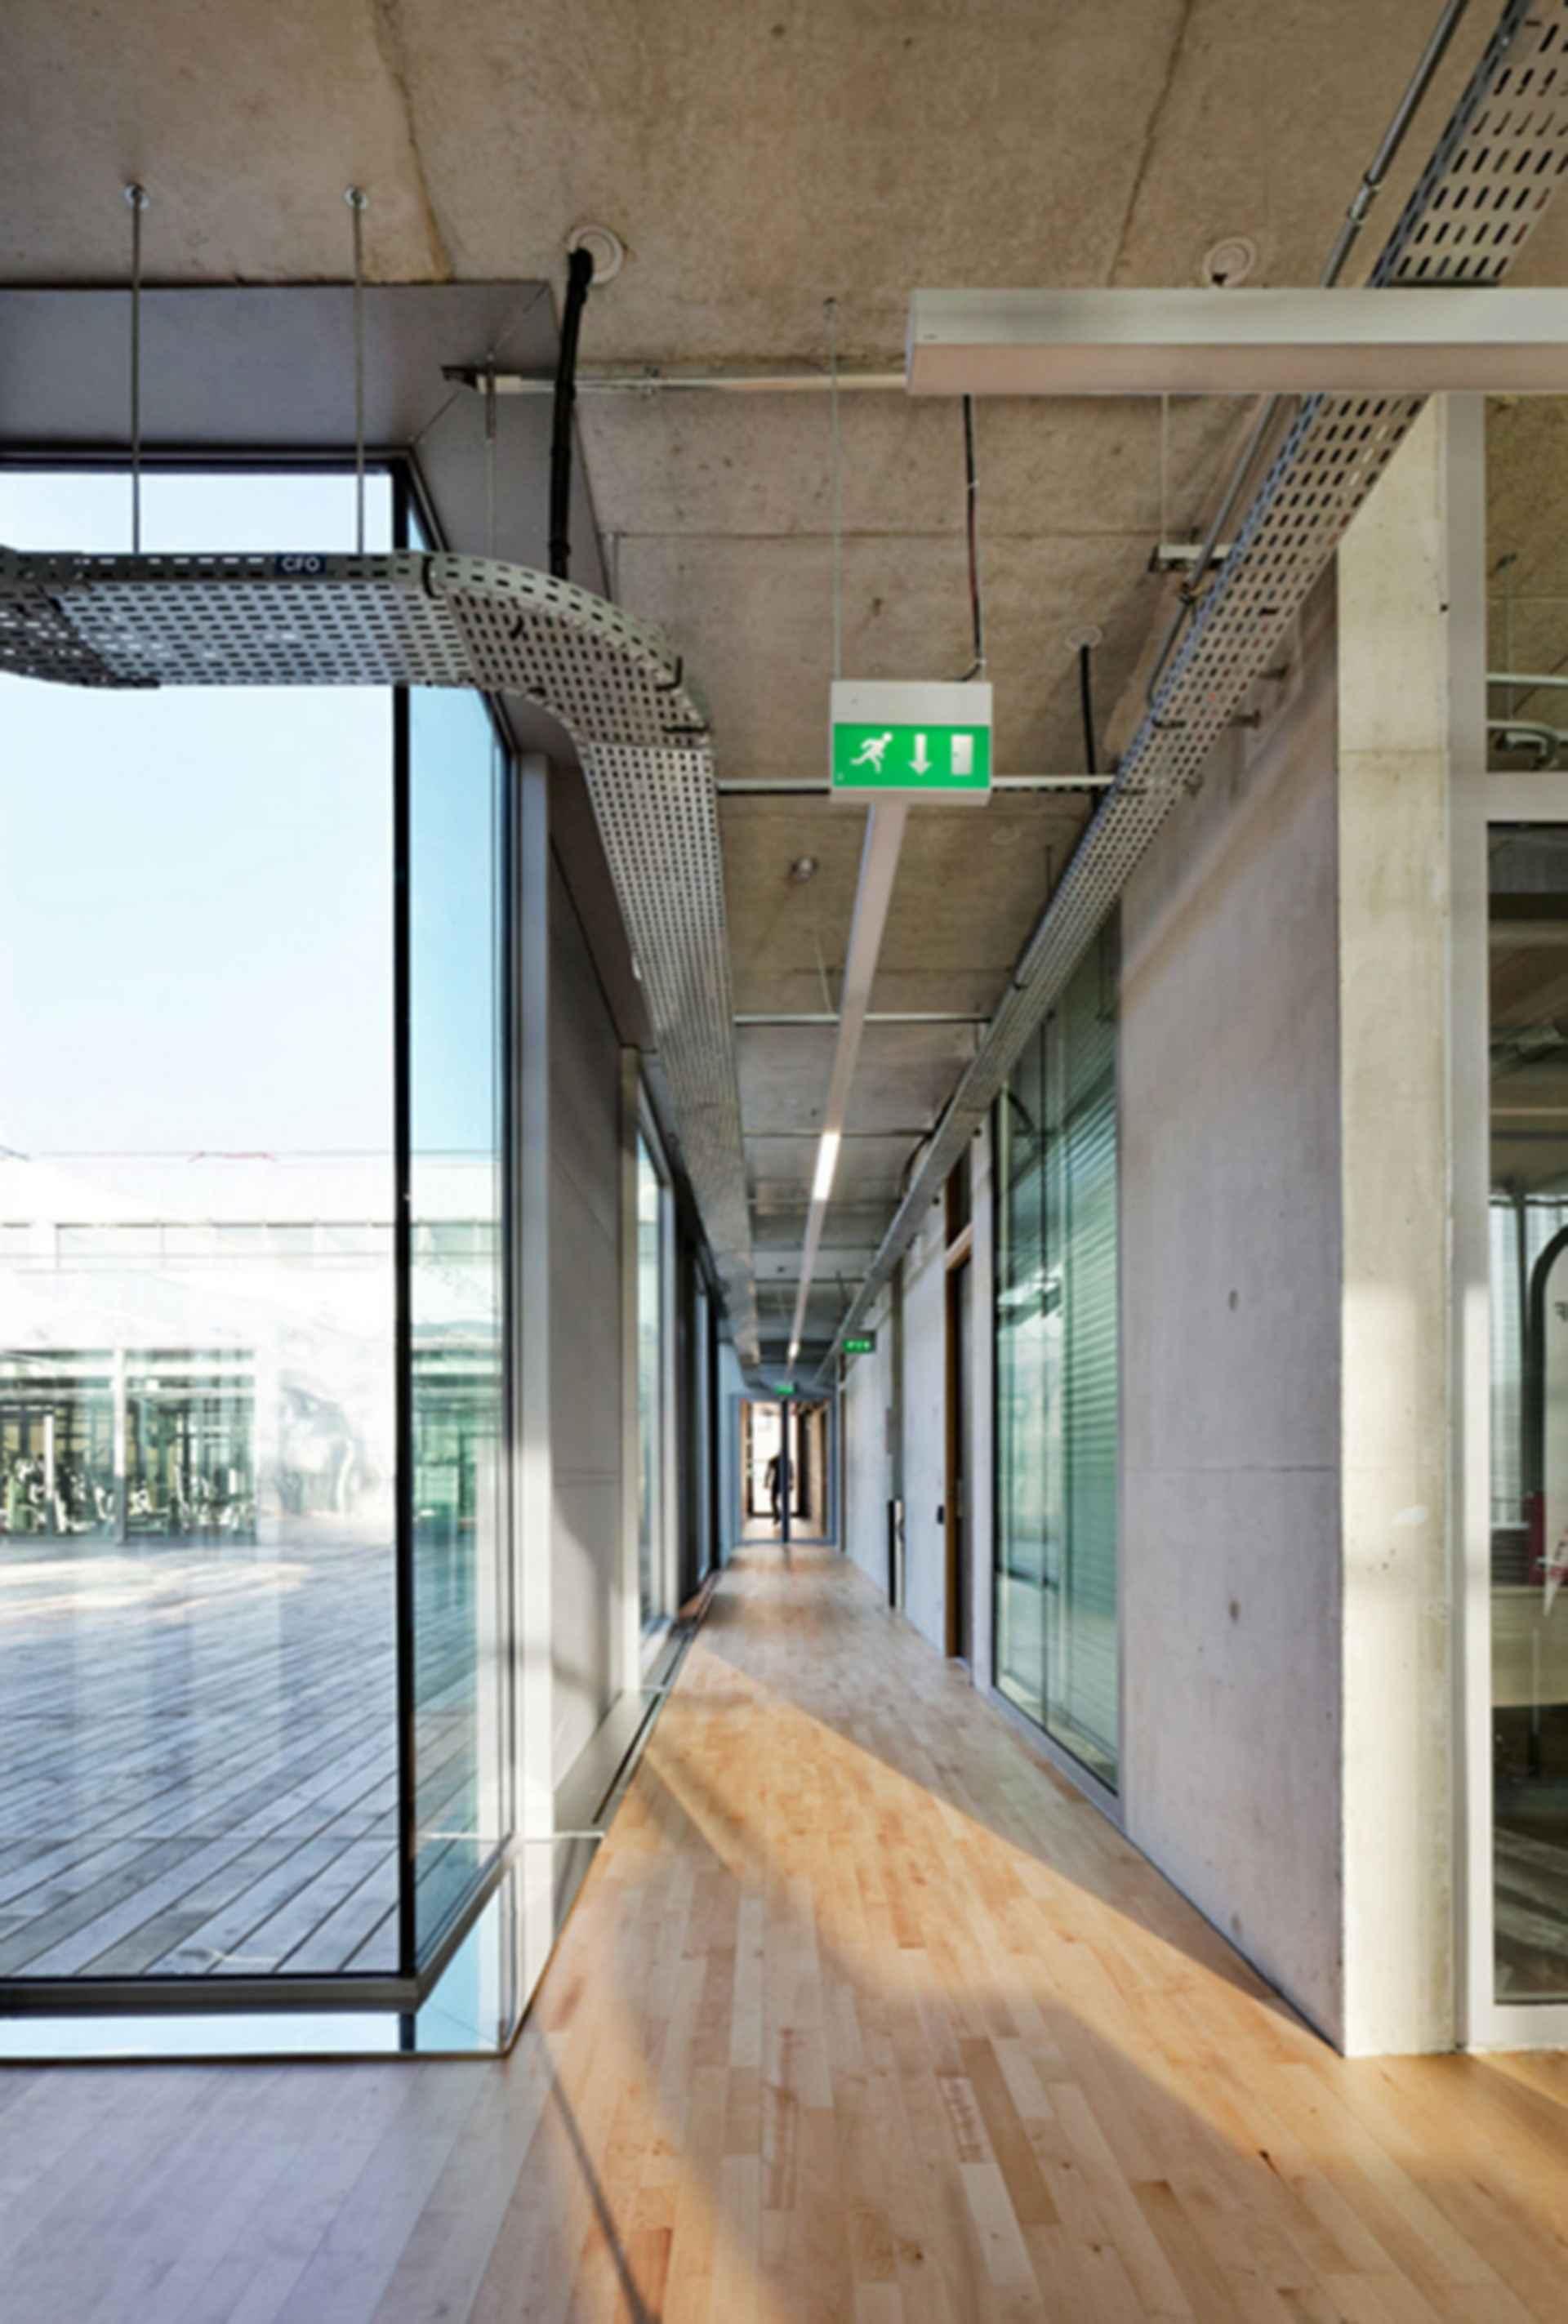 Sports Center Jules Ladoumegue - Interior/Hallway